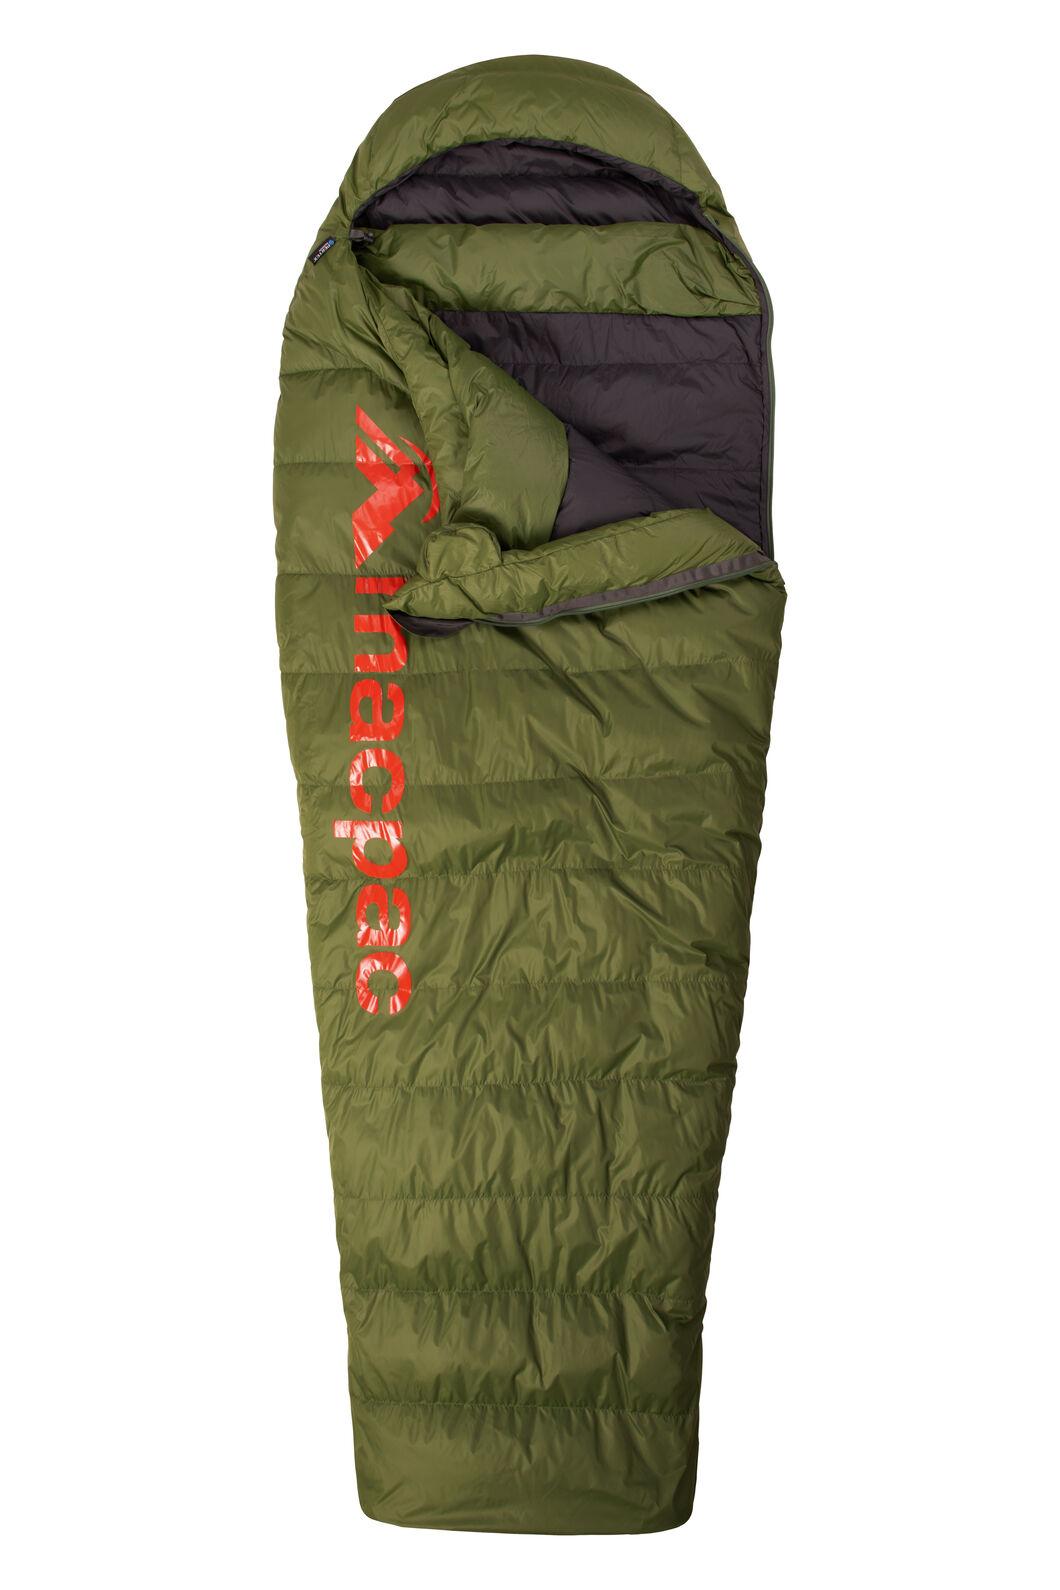 Macpac Overland 400 Standard Down Sleeping Bag, Chive, hi-res